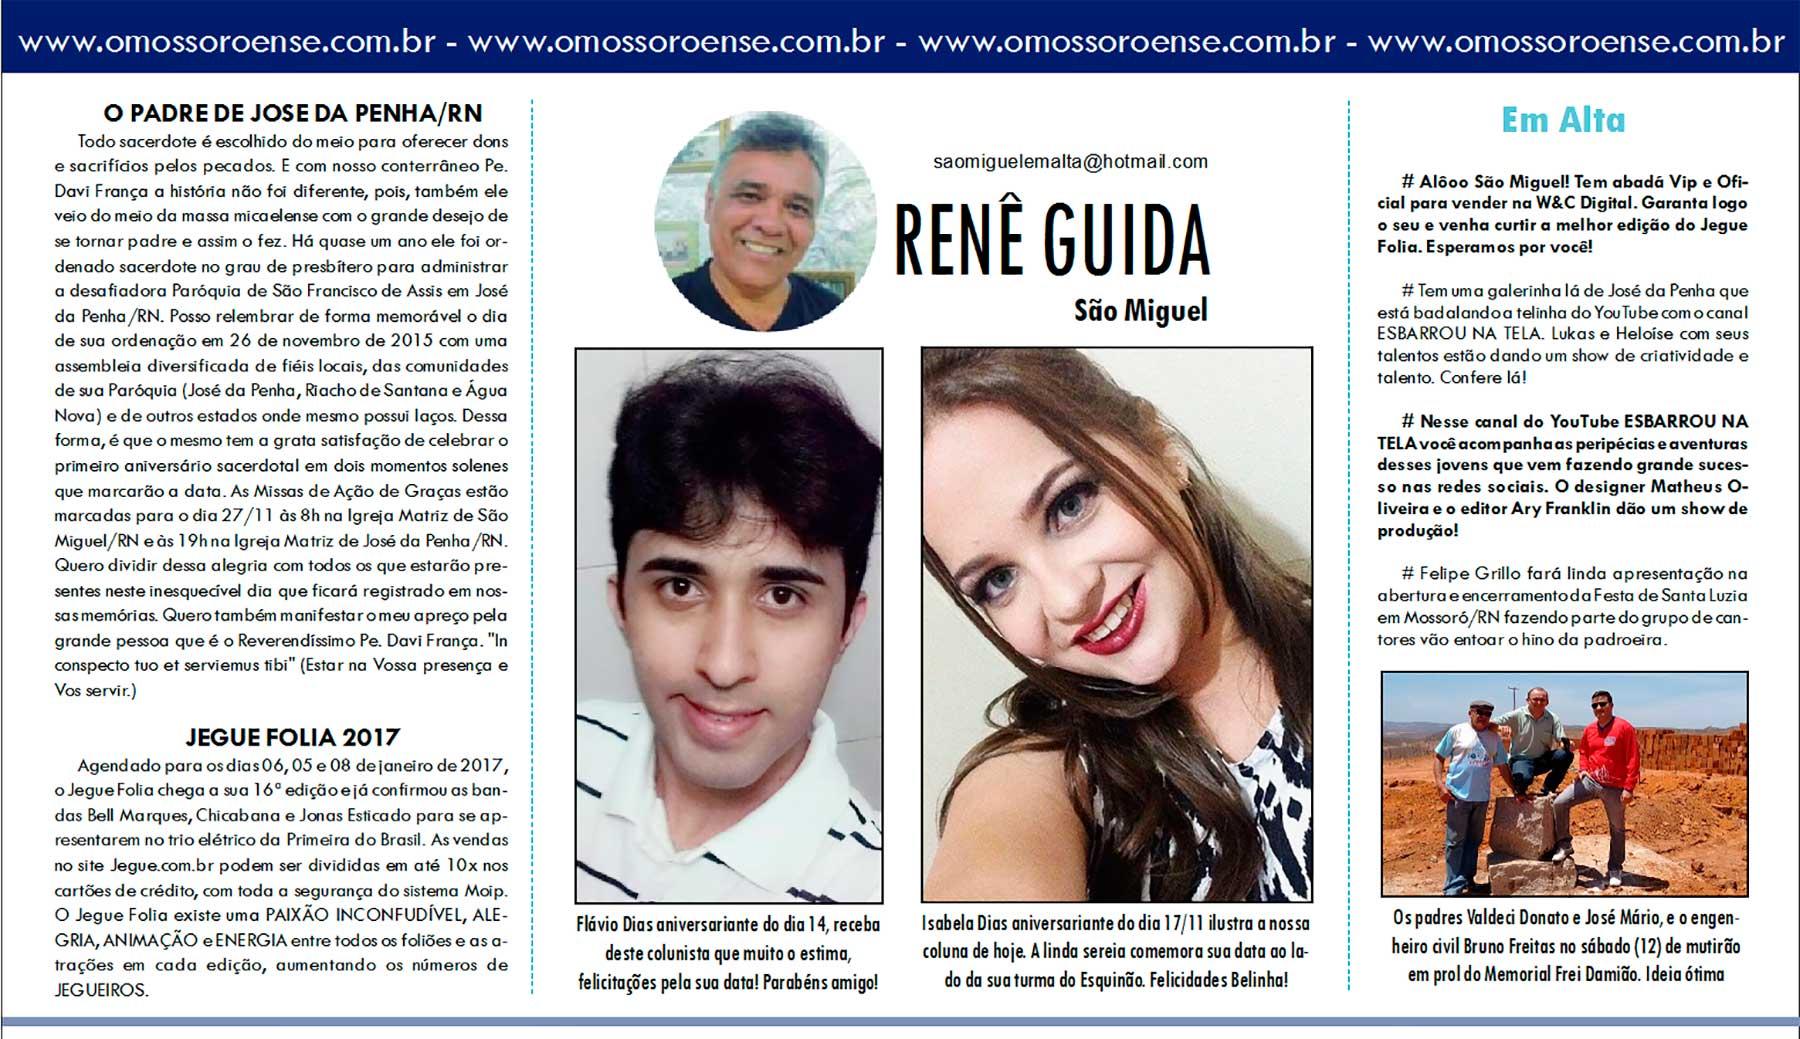 rene-guida-16-11-2016